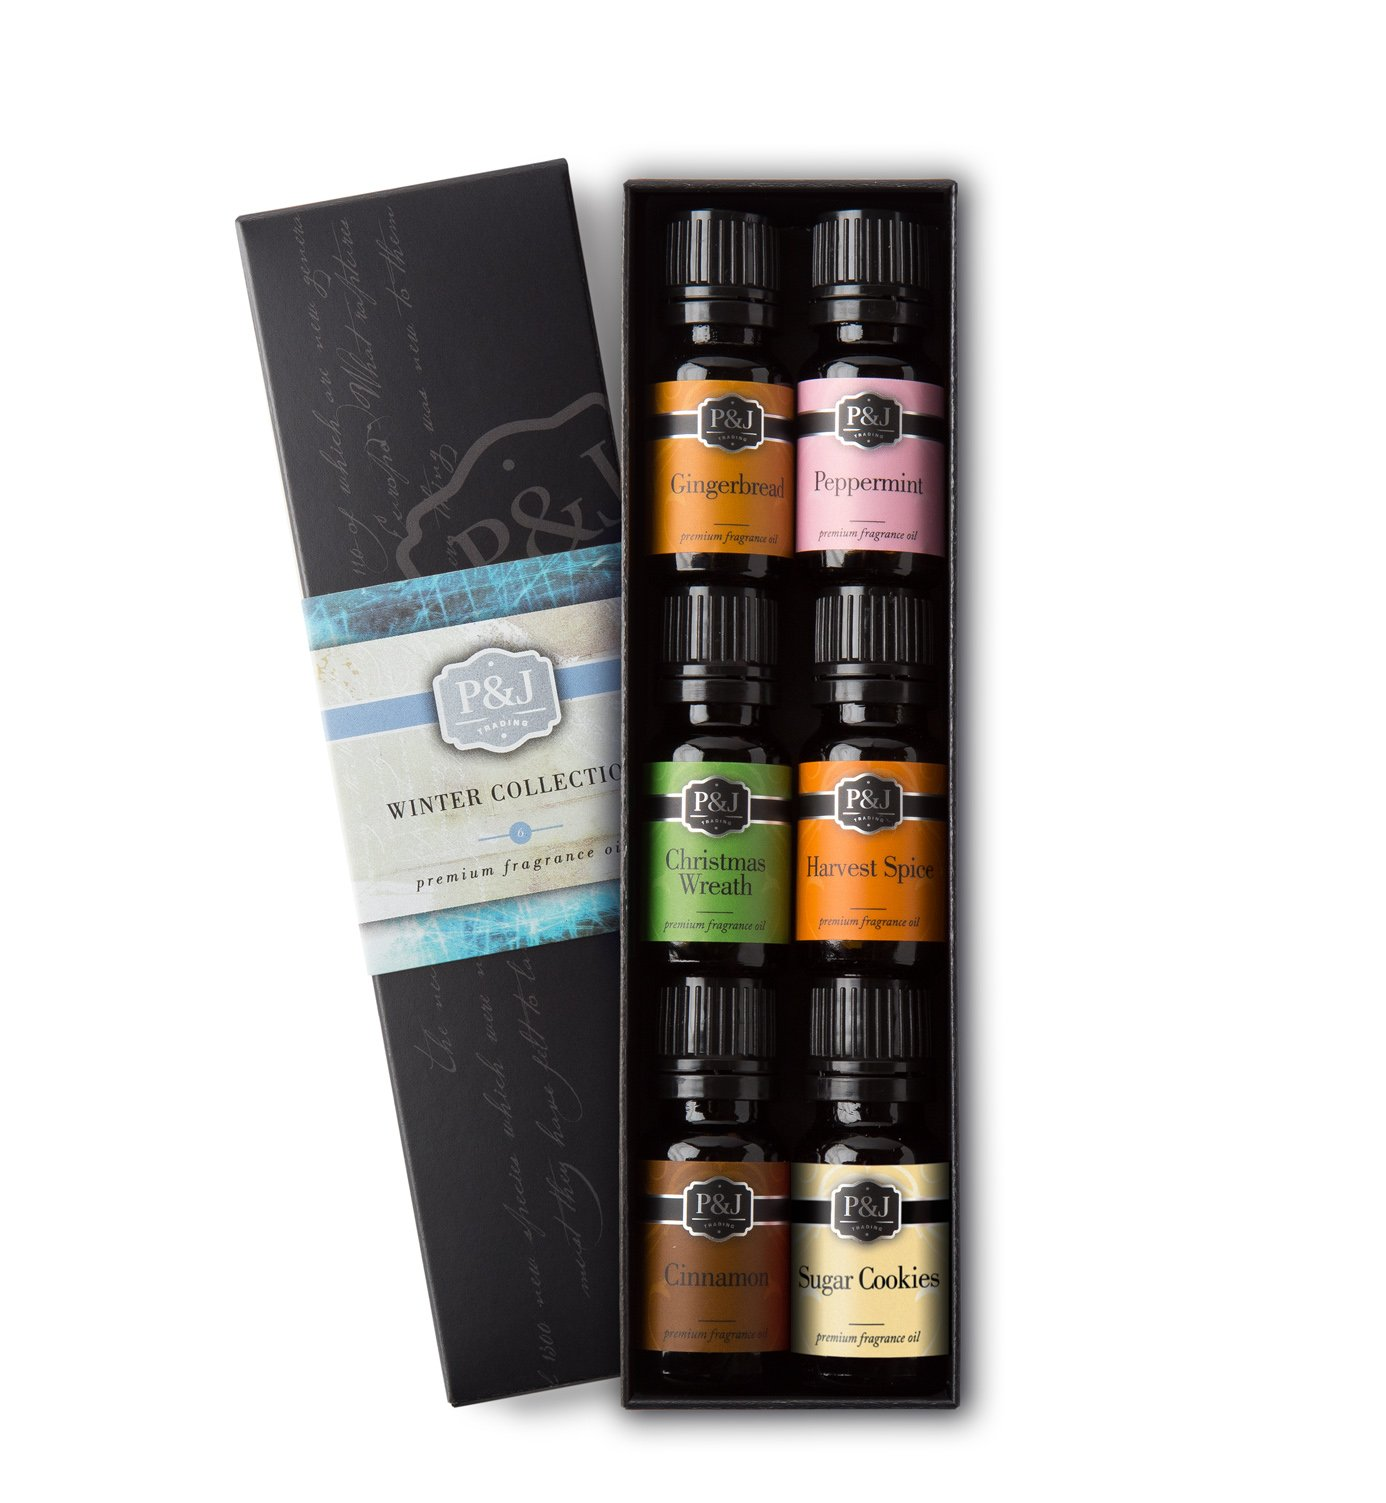 Winter Set of 6 Premium Grade Fragrance Oils - Cinnamon, Gingerbread, Sugar Cookies, Harvest Spice, Peppermint, Christmas Wreath - 10ml